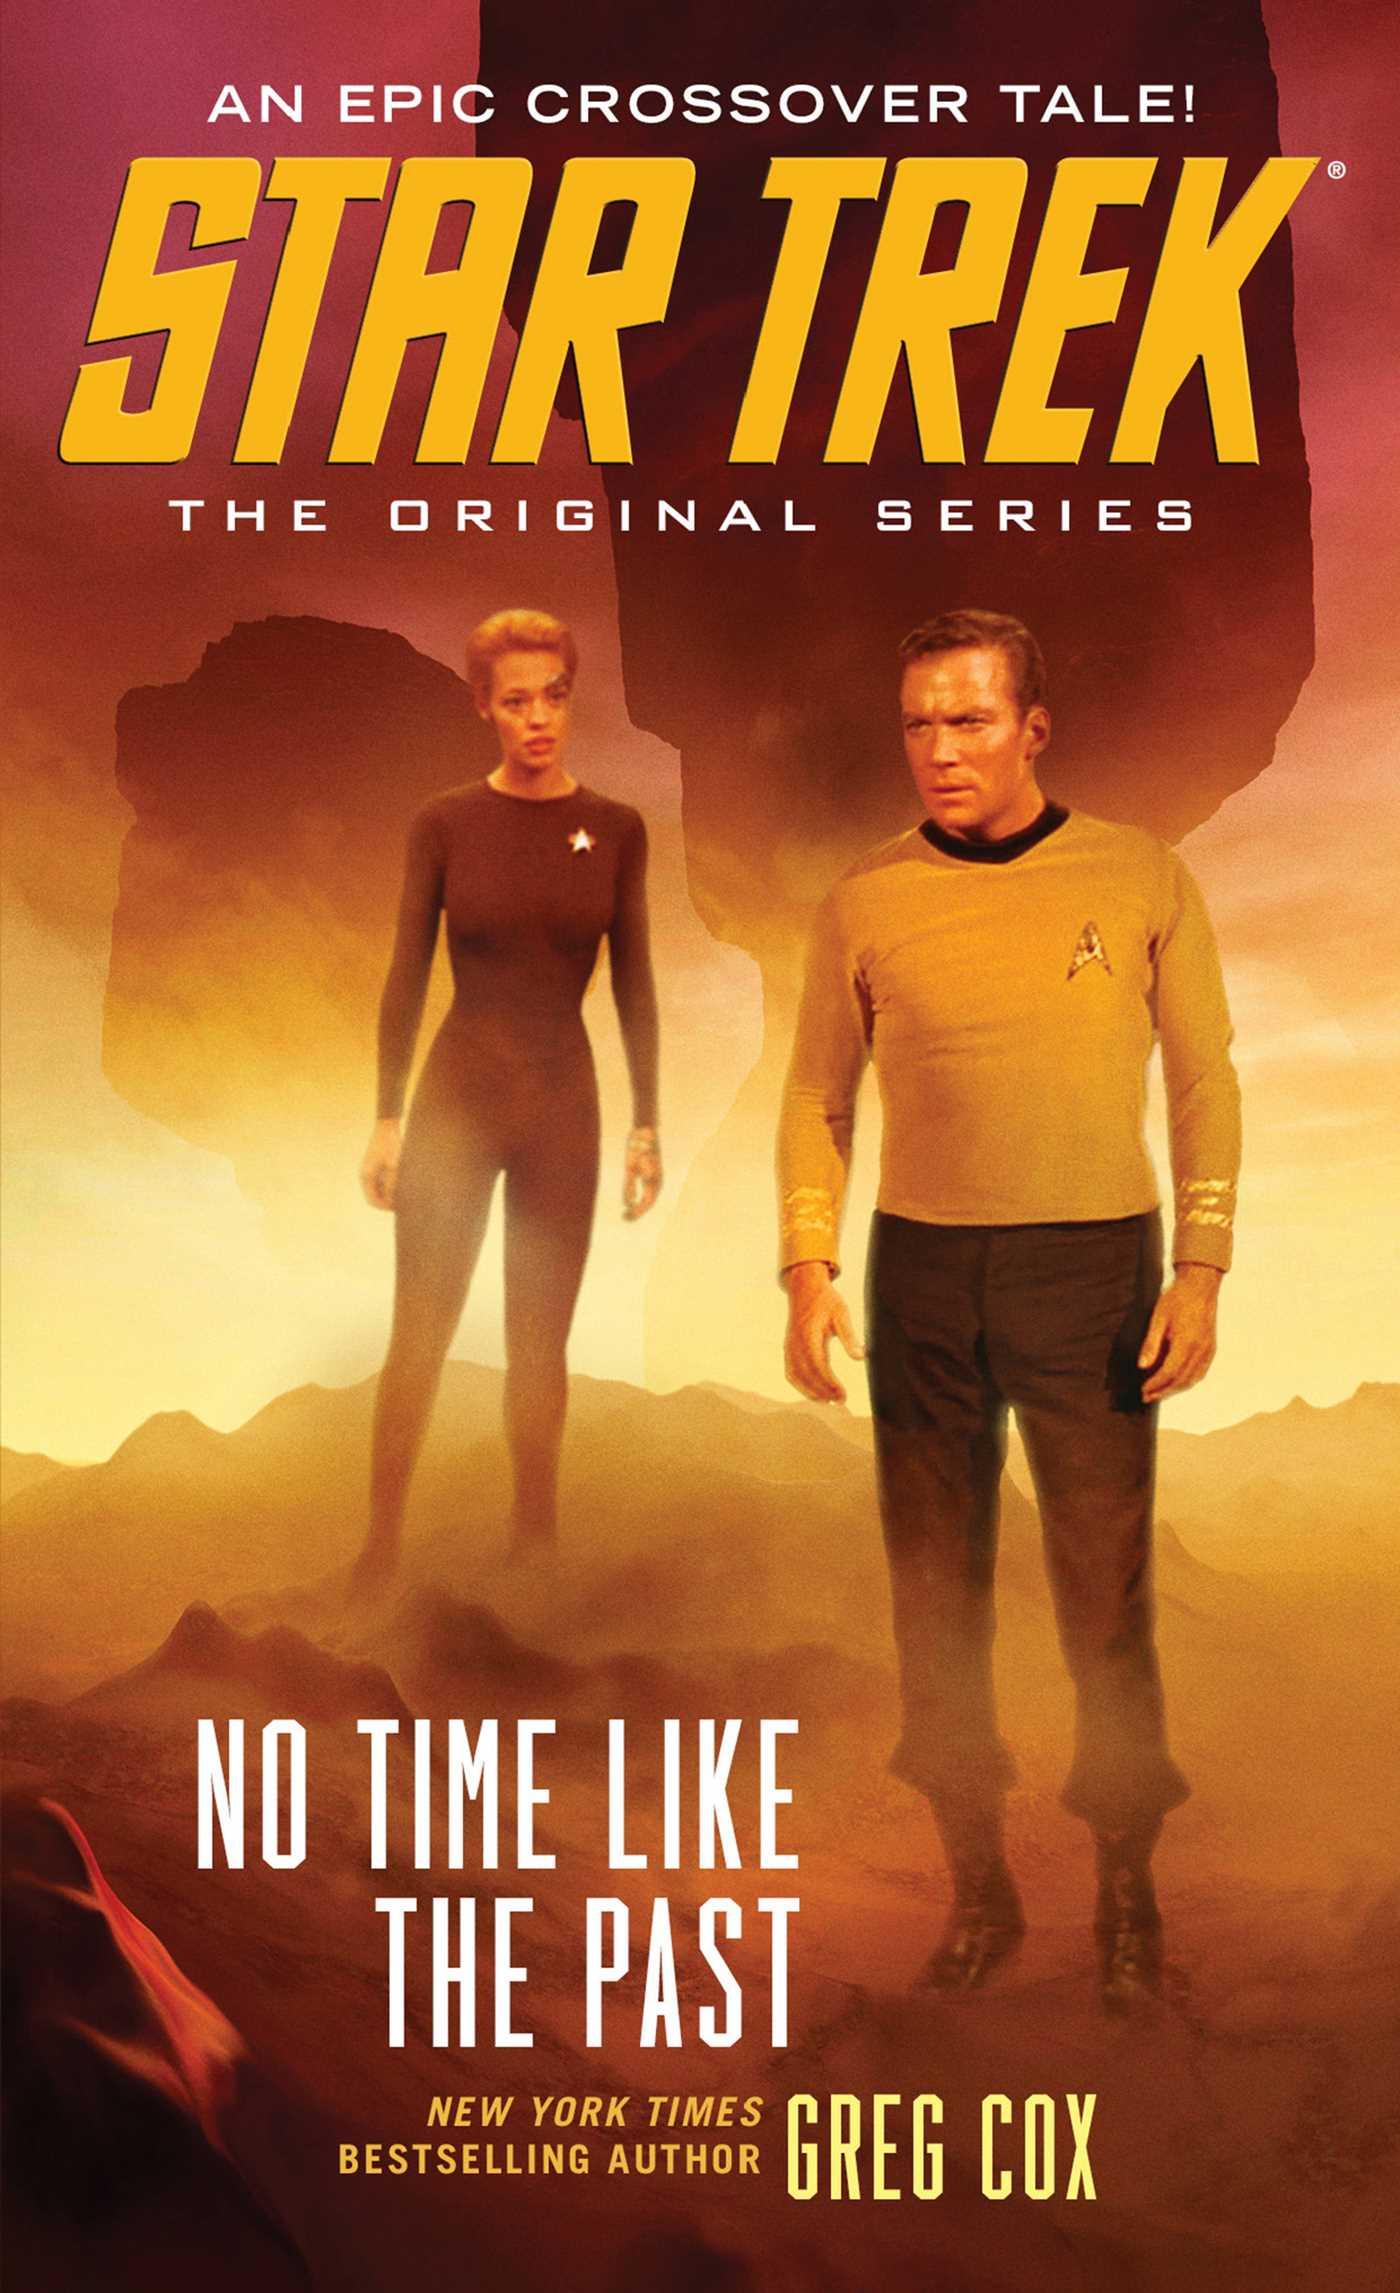 Star trek the original series no time like the past 9781476749501 hr